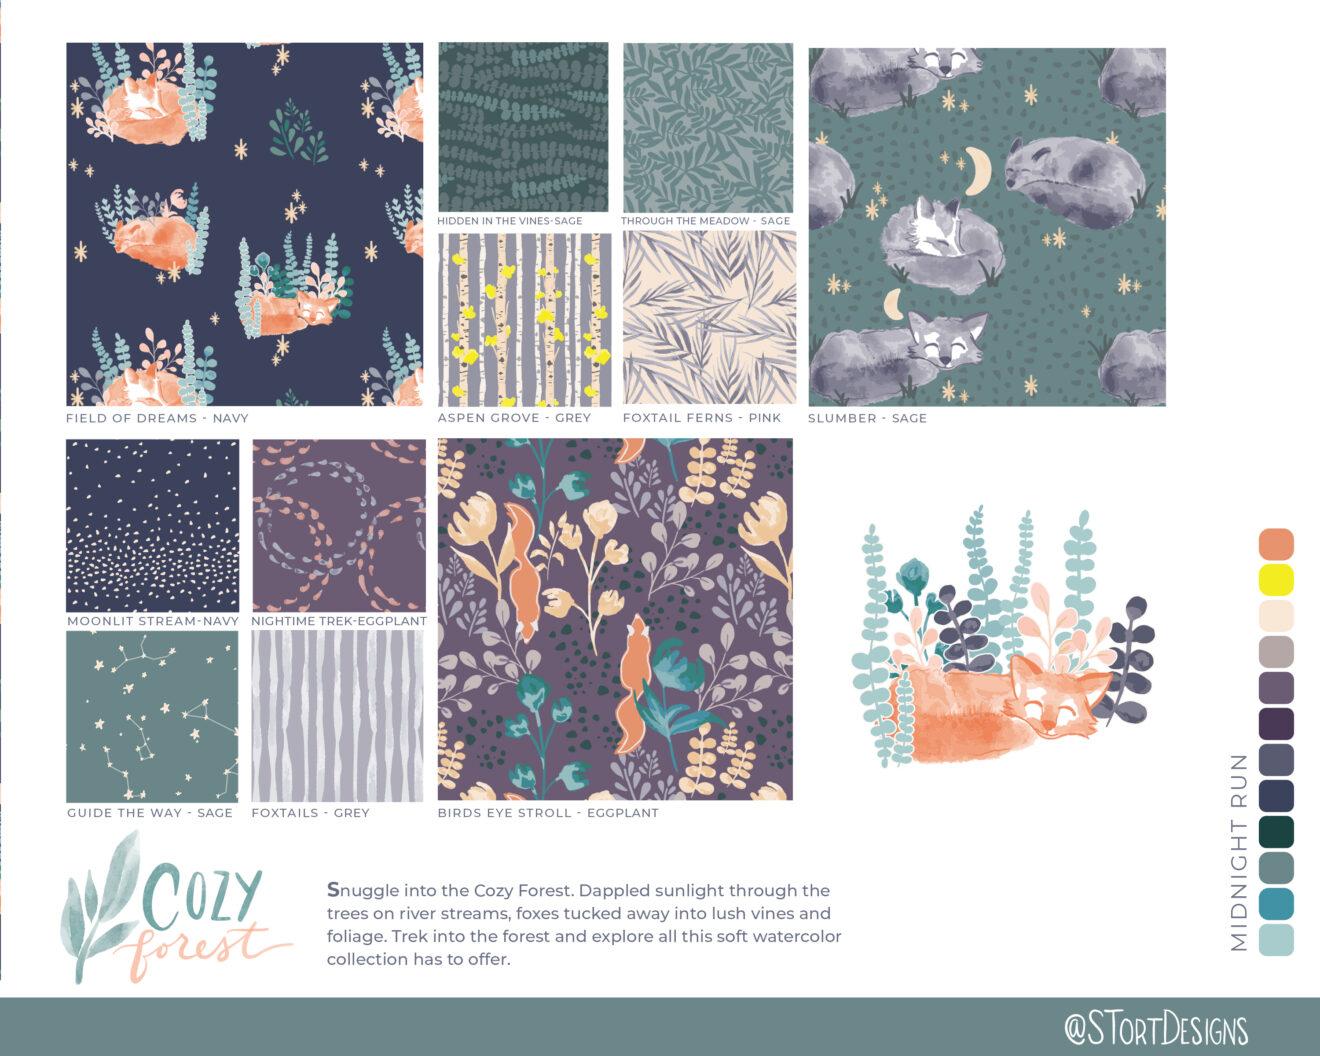 Cozy Forest STortDesigns - Midnight Run